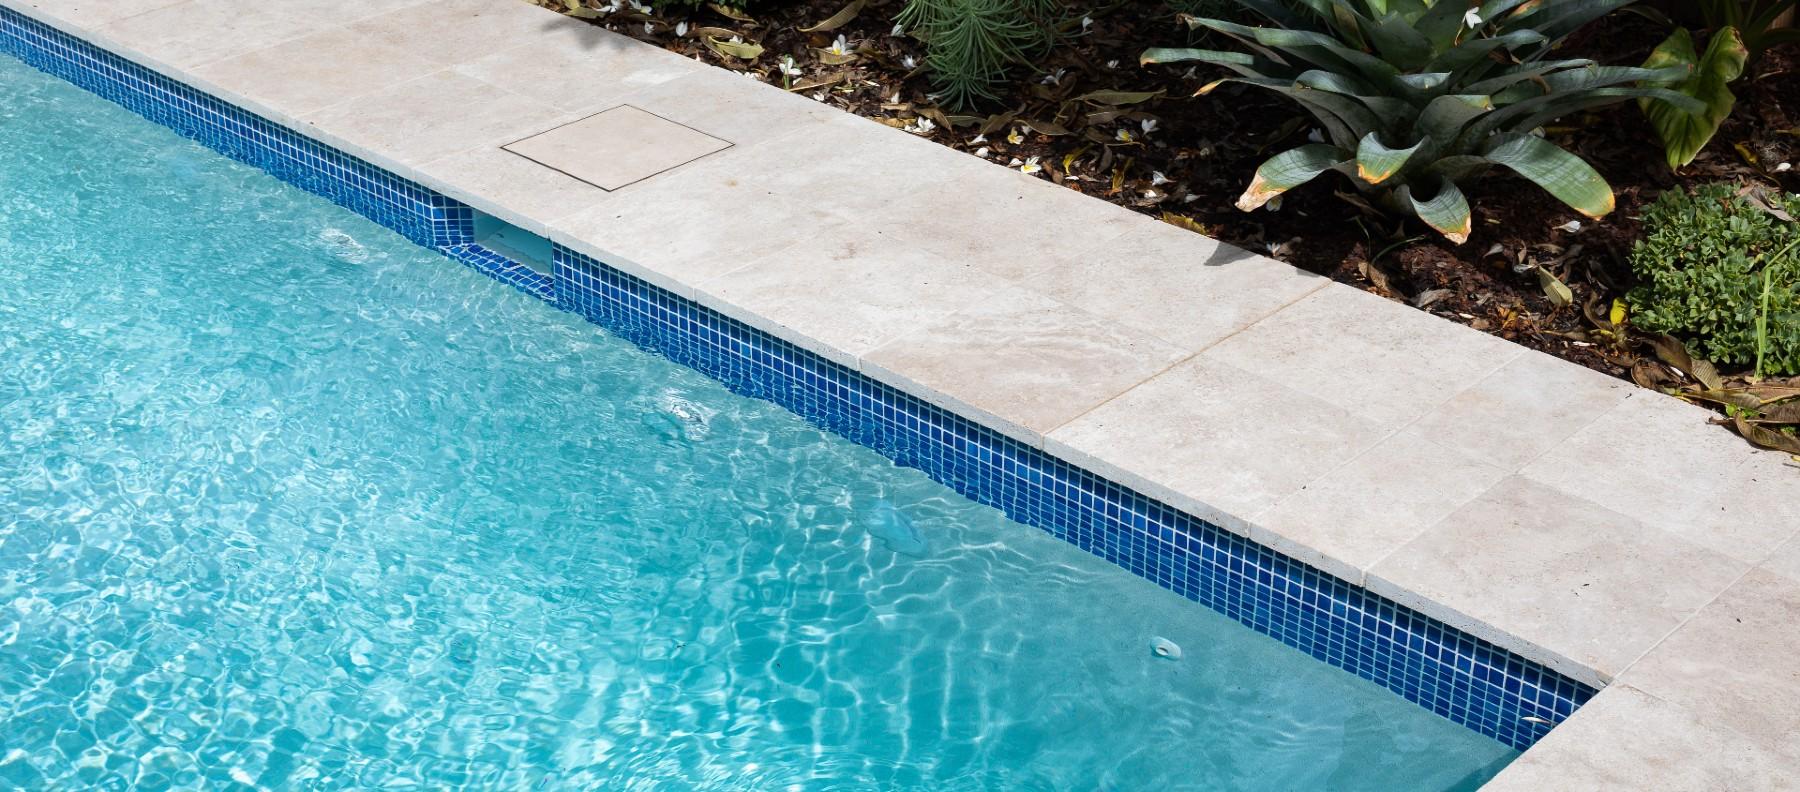 marrickville travertine pool coping